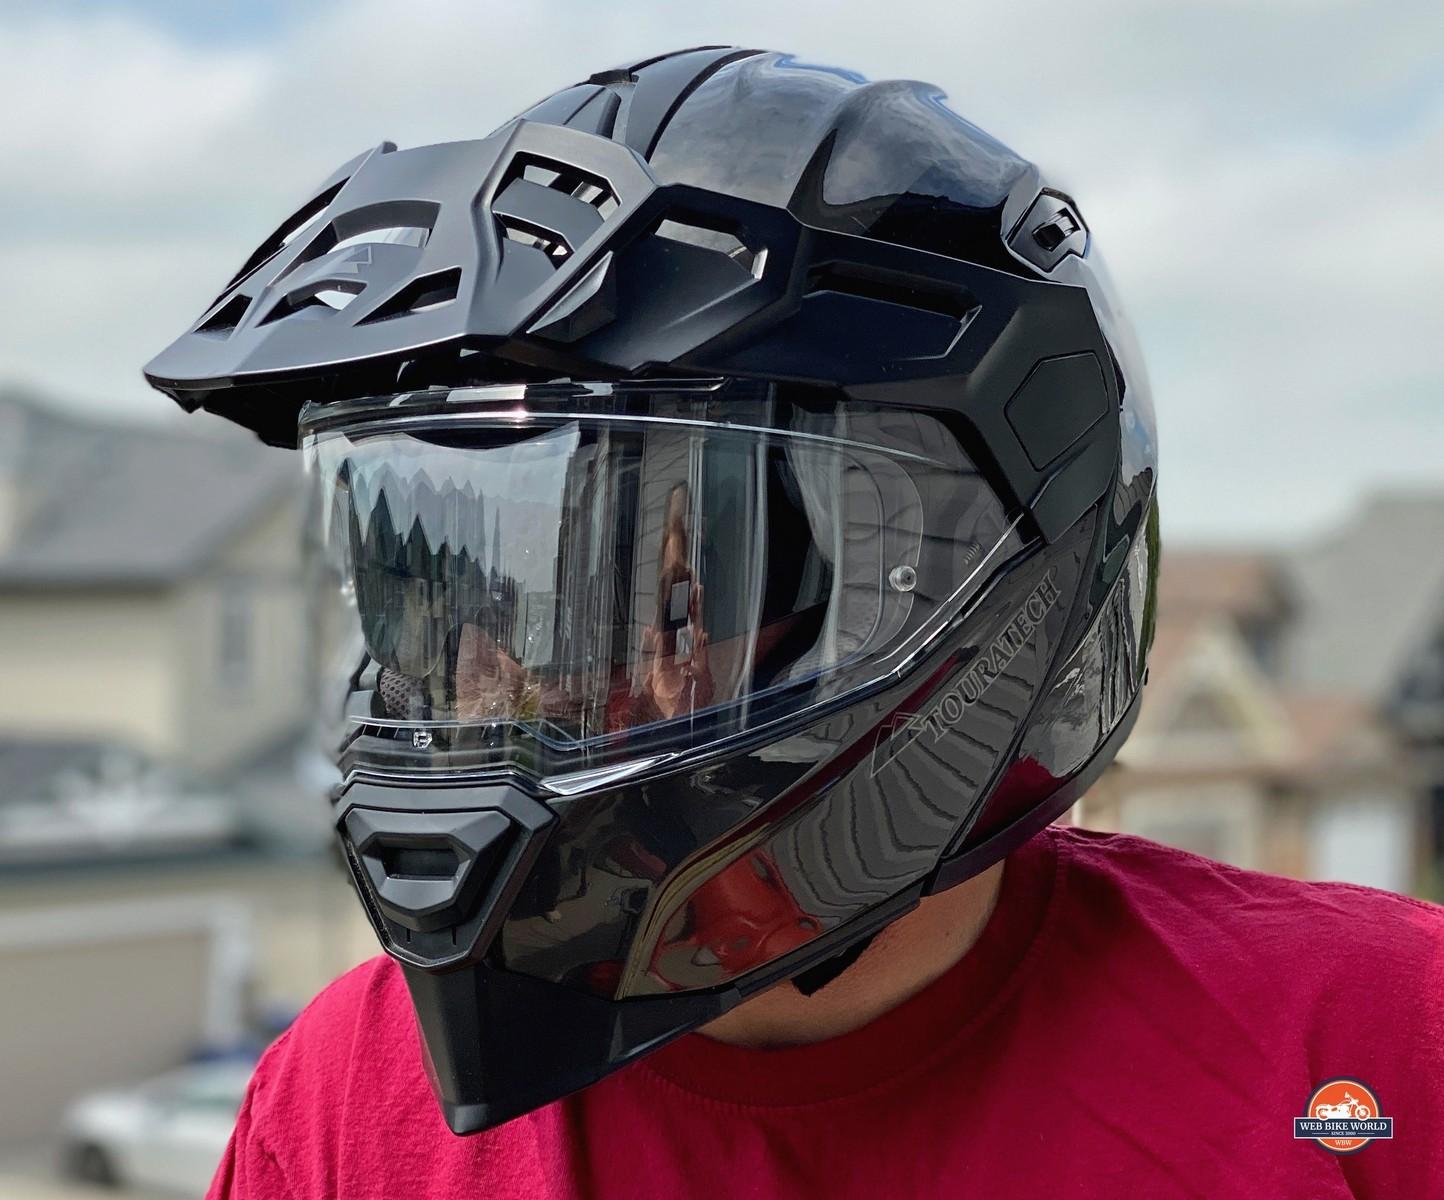 Touratech Aventuro Traveller Carbon helmet with closed visor.